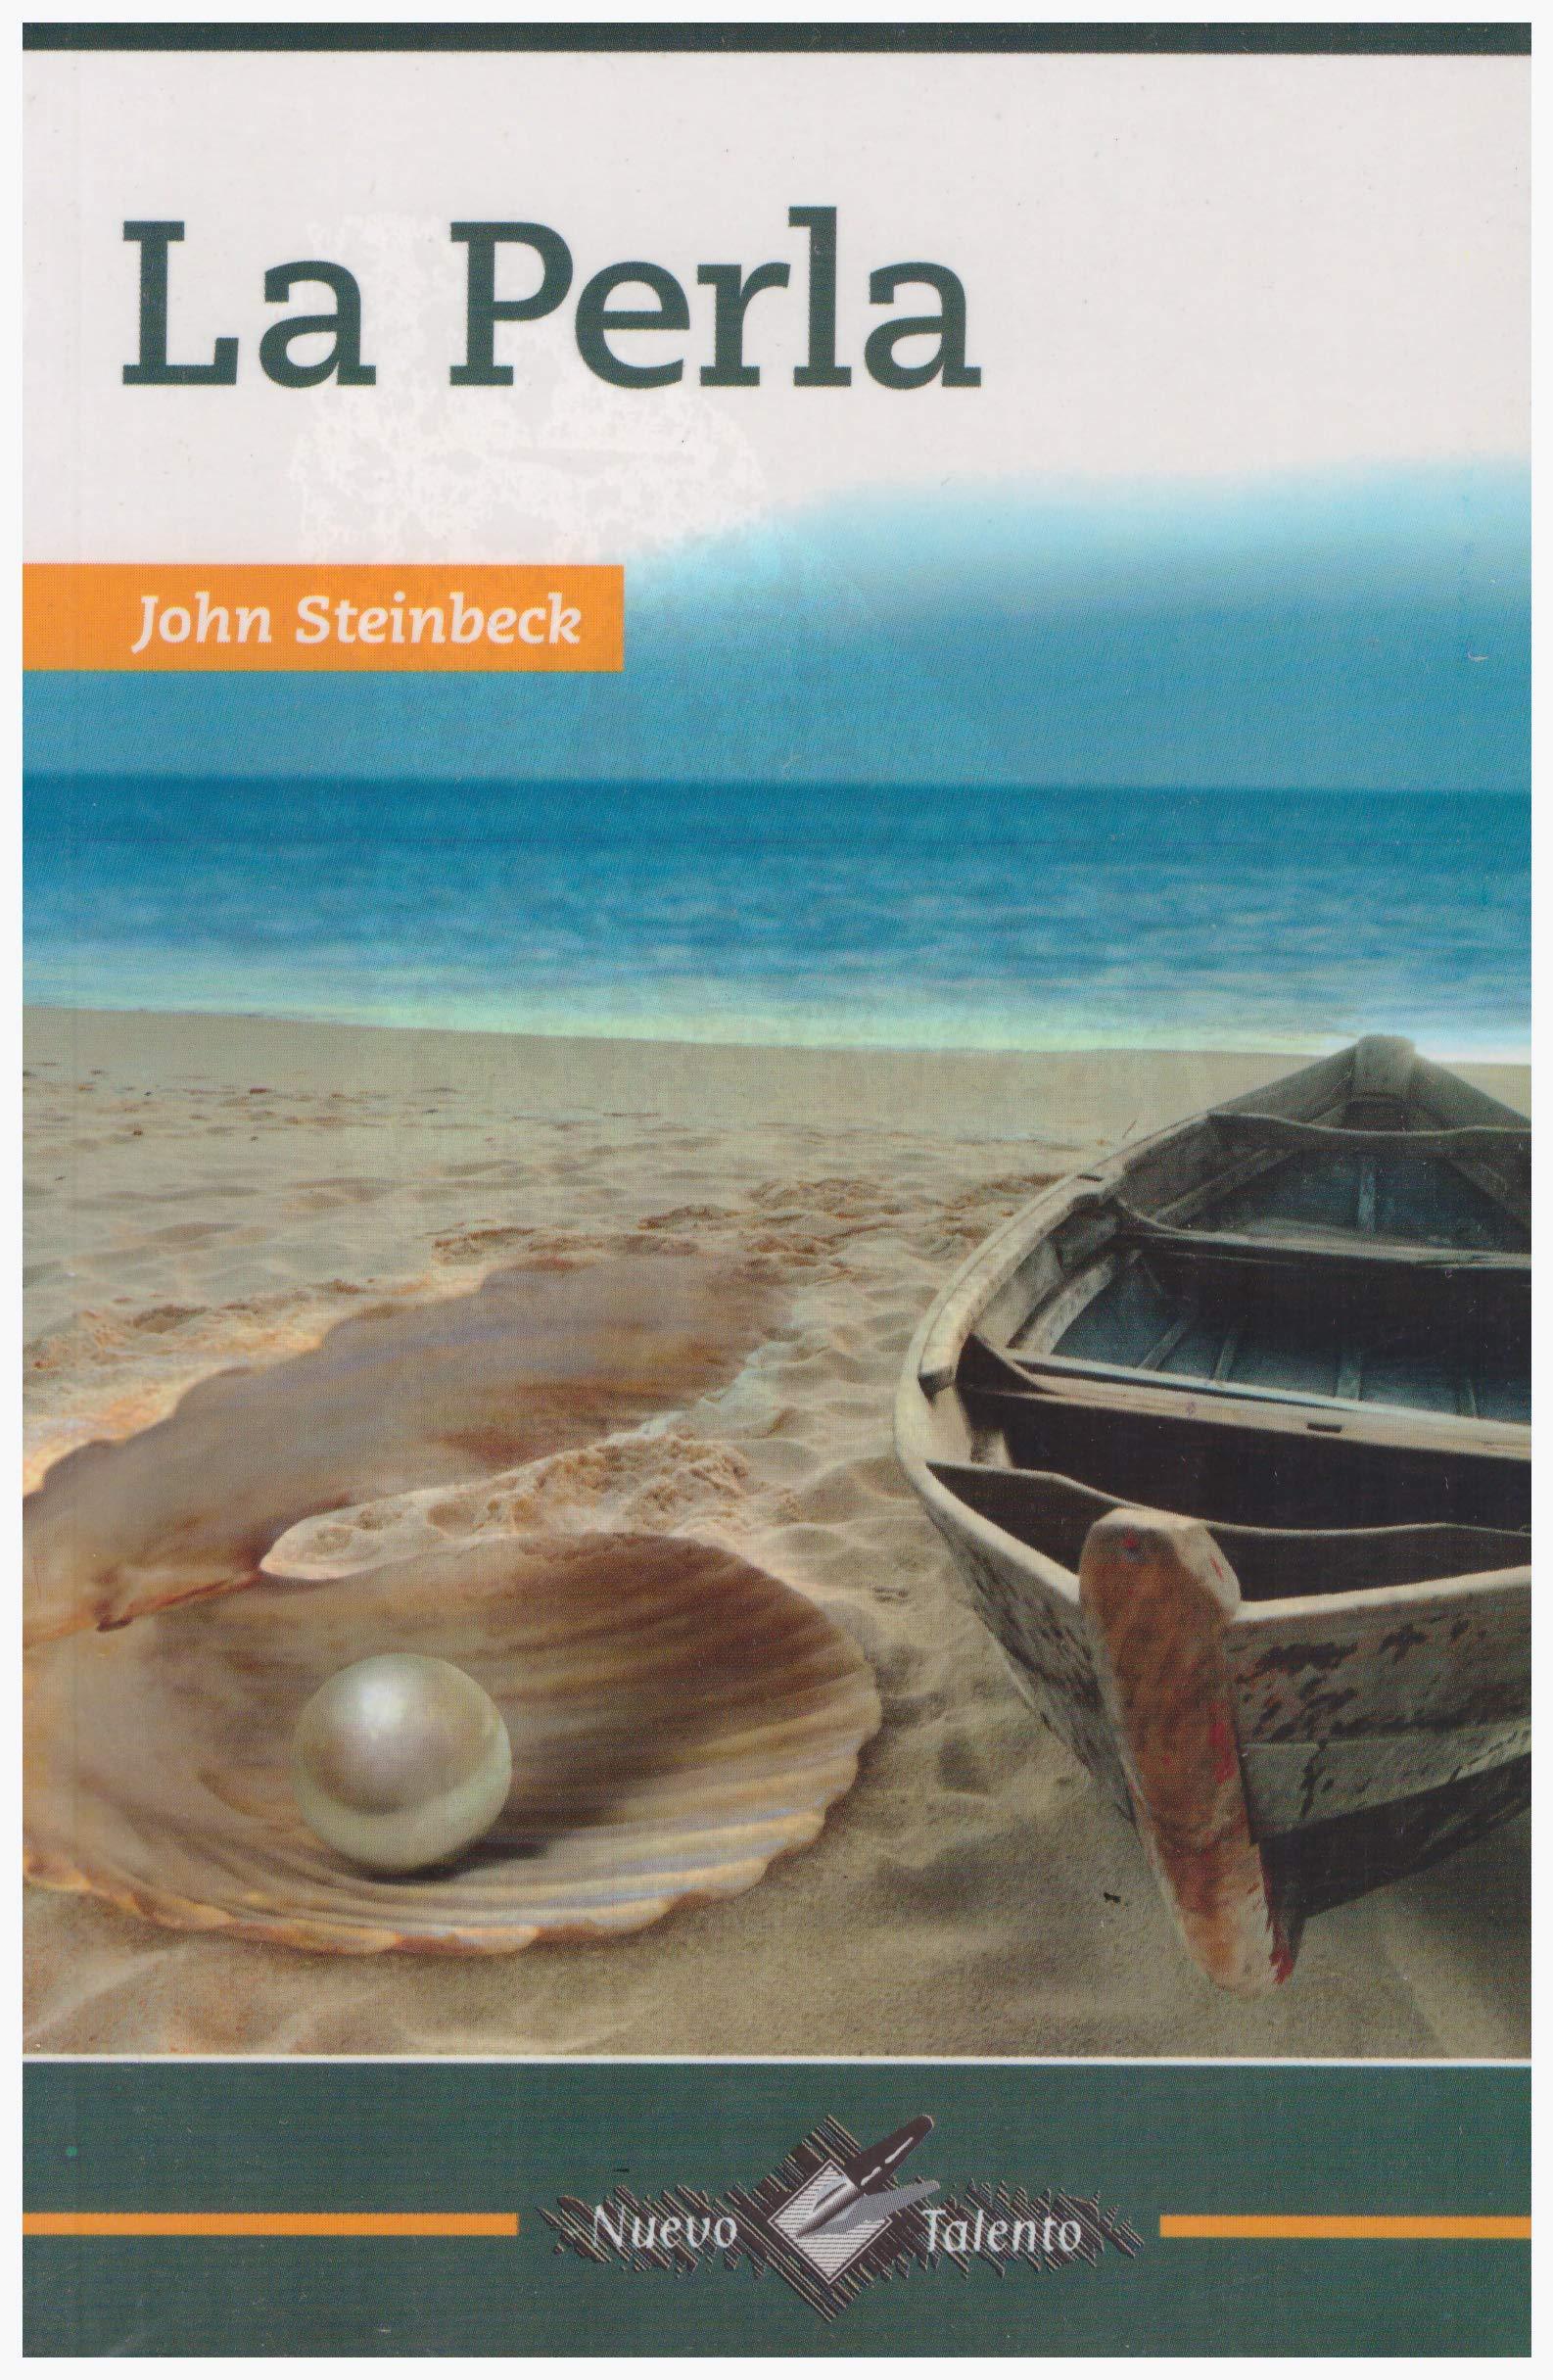 La Perla: Amazon.es: Steinbeck, John: Libros